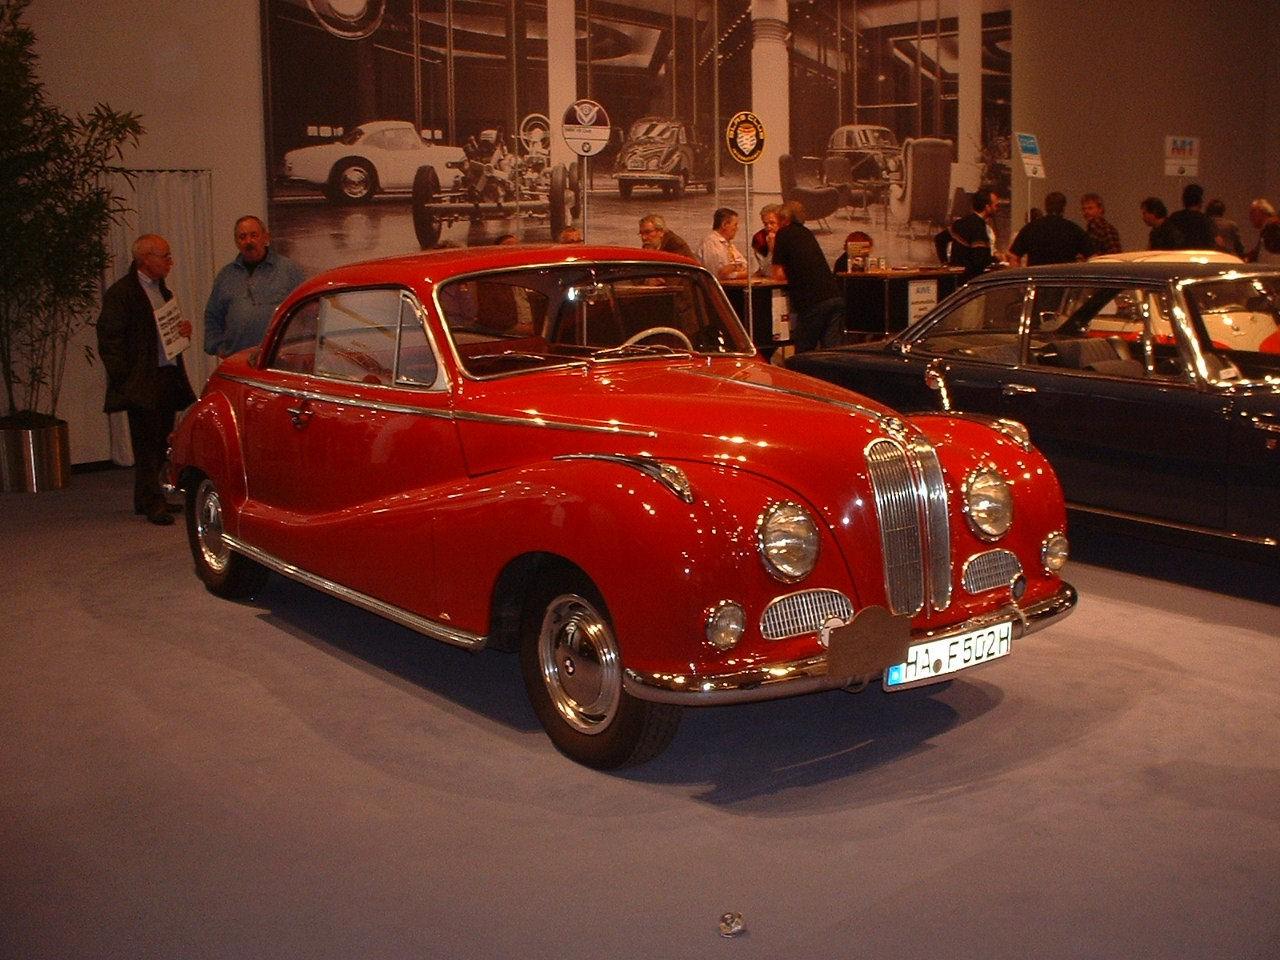 1954 bmw 502 cabriolet - photo #14